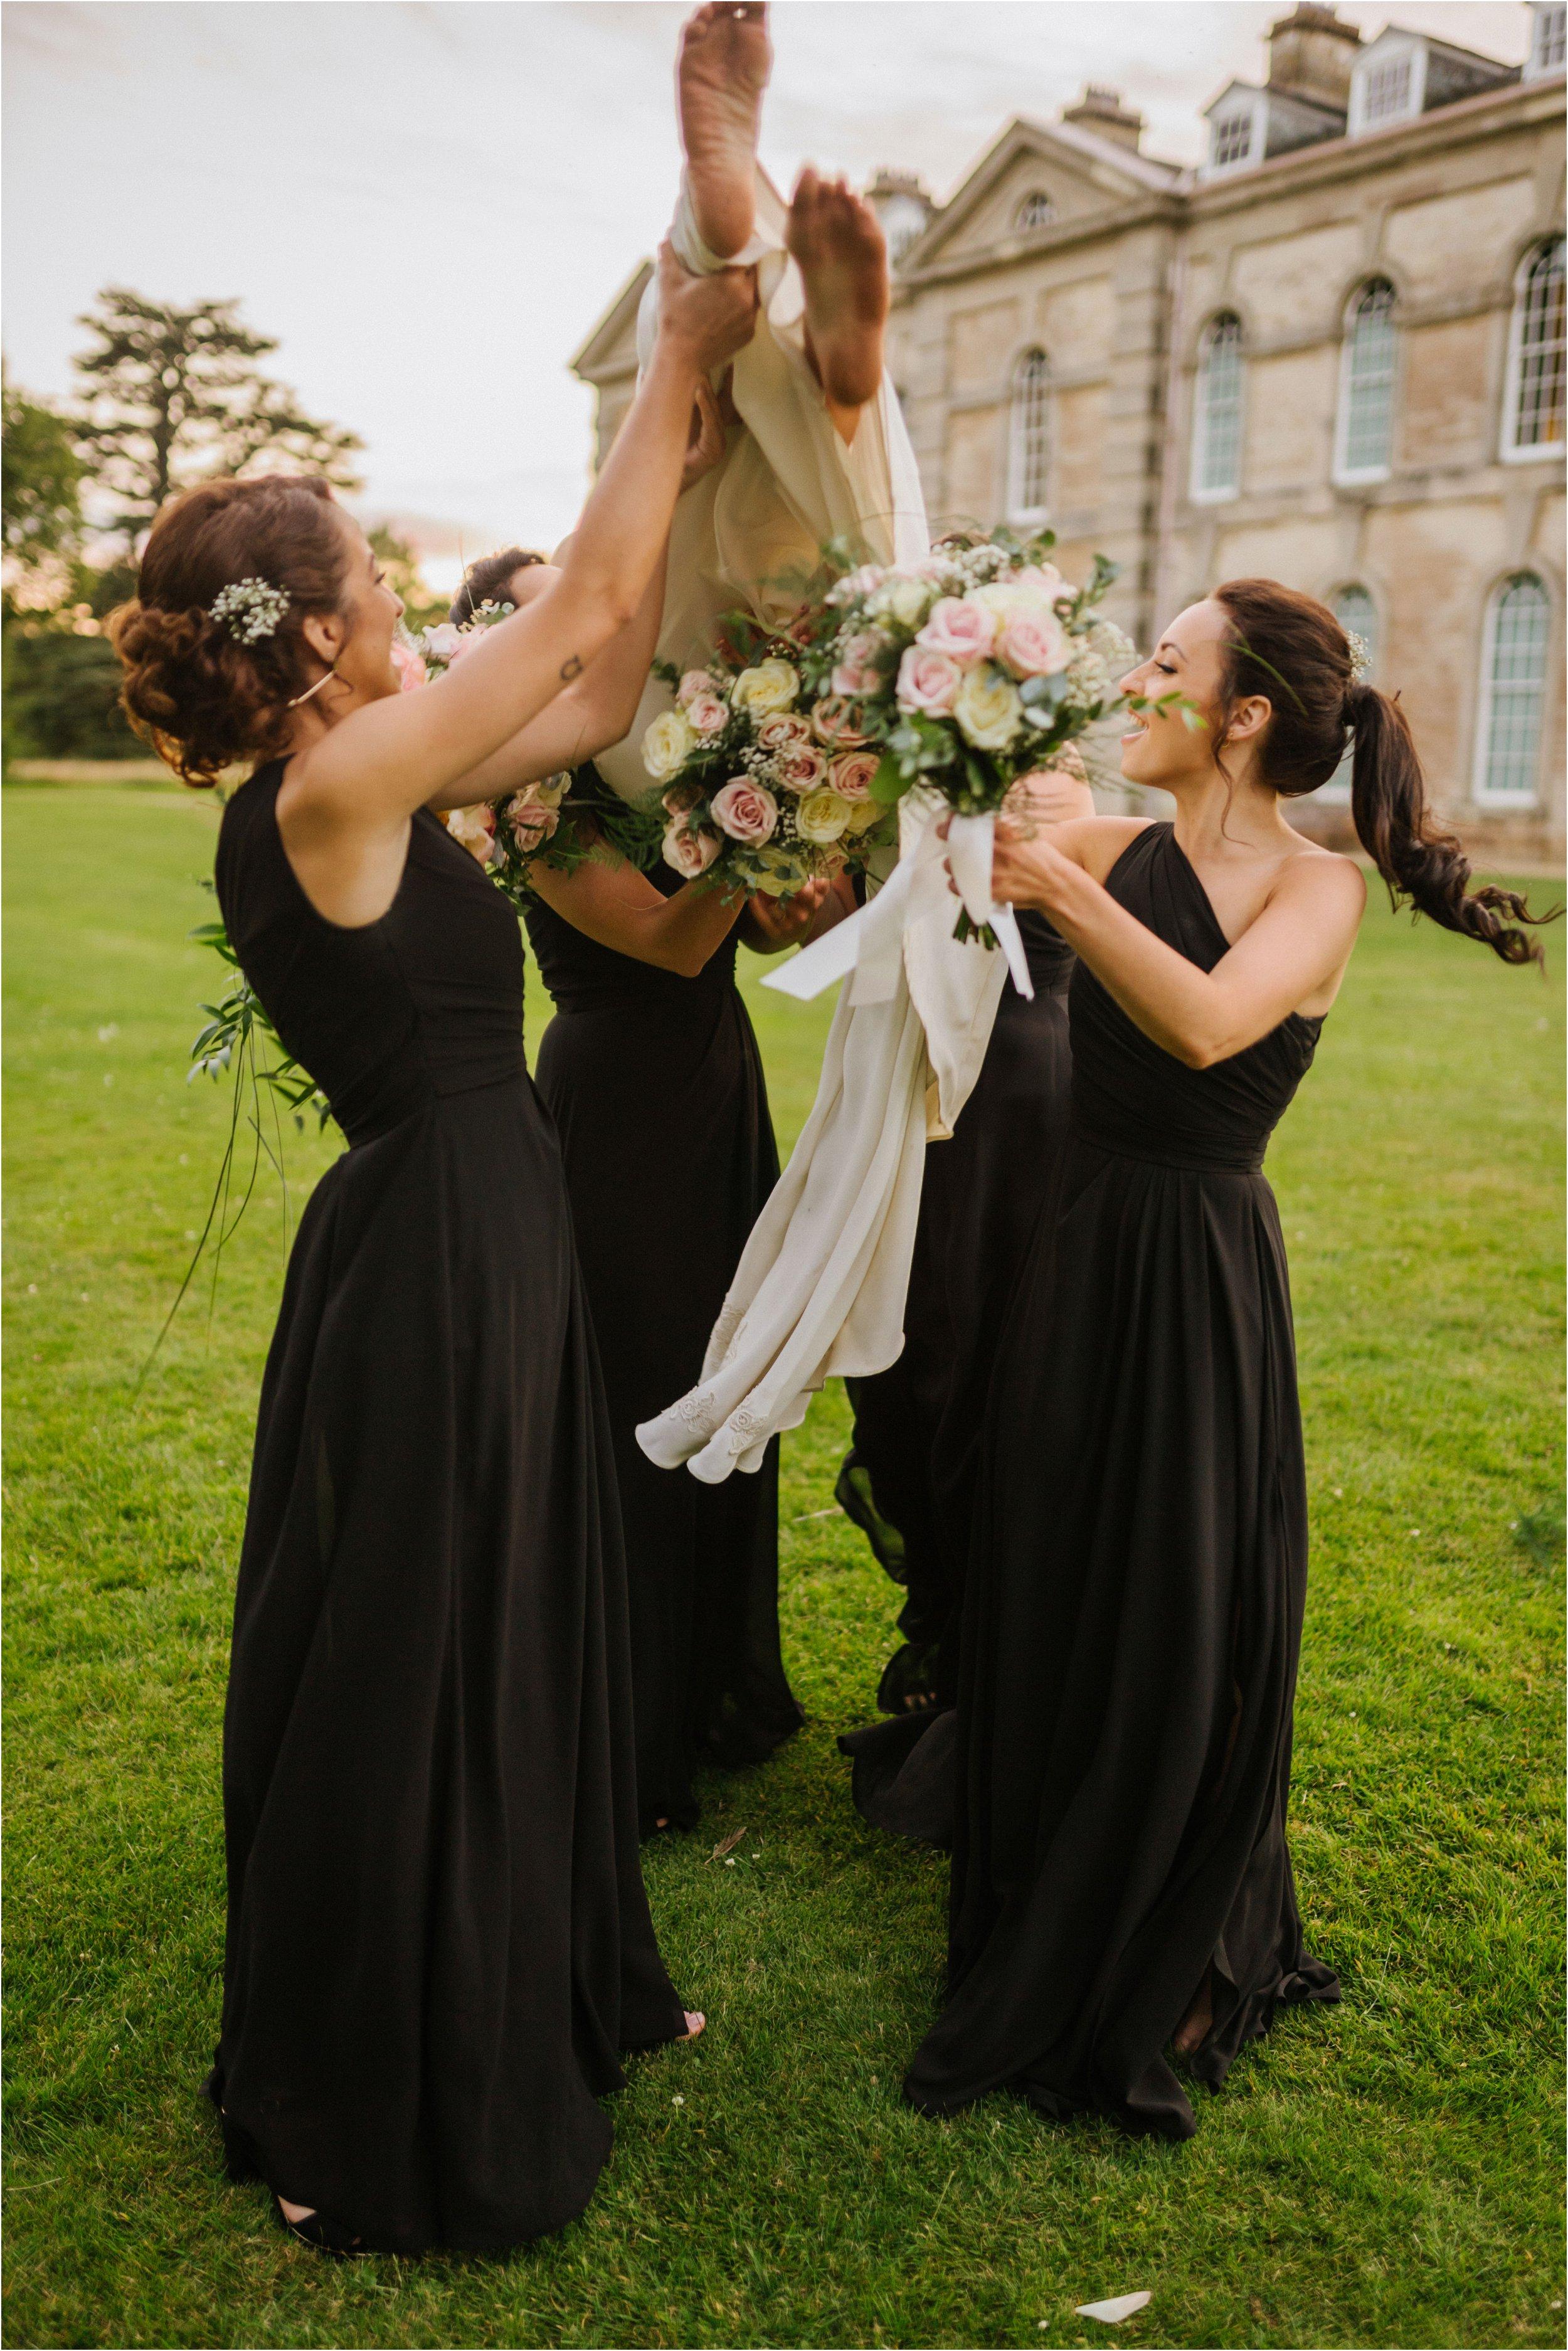 Compton Verney wedding photography_0188.jpg